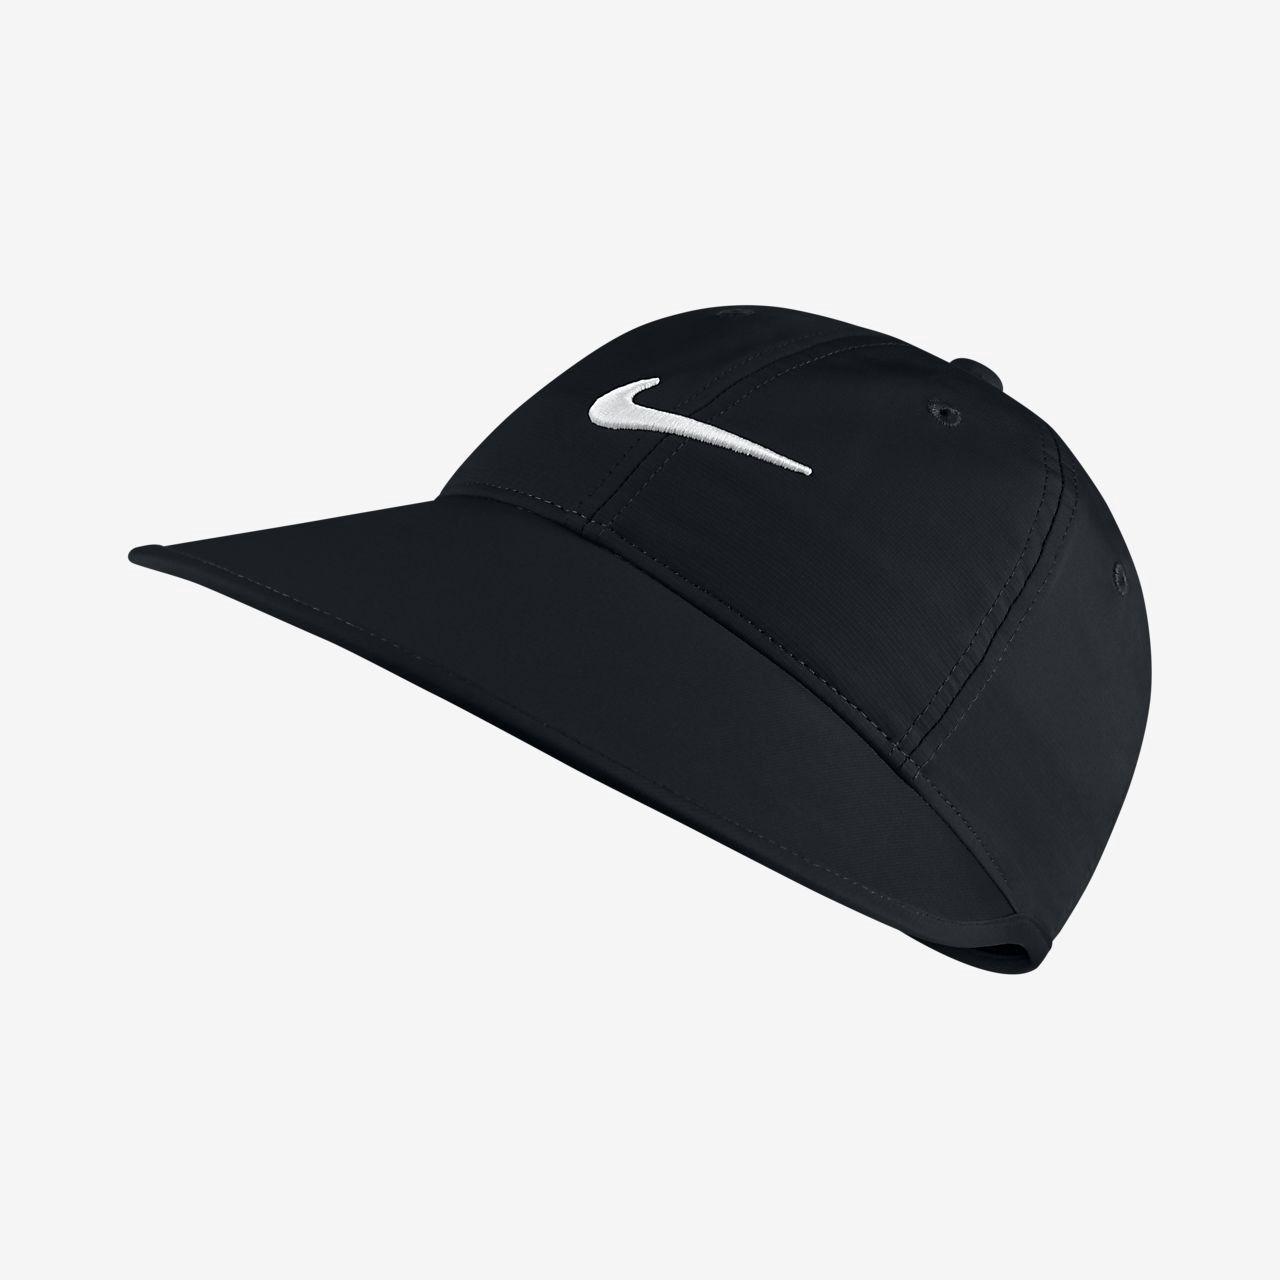 Nike Big Bill Women s Adjustable Golf Hat - One Size Black Black Anthracite  White a470f98d6fc9